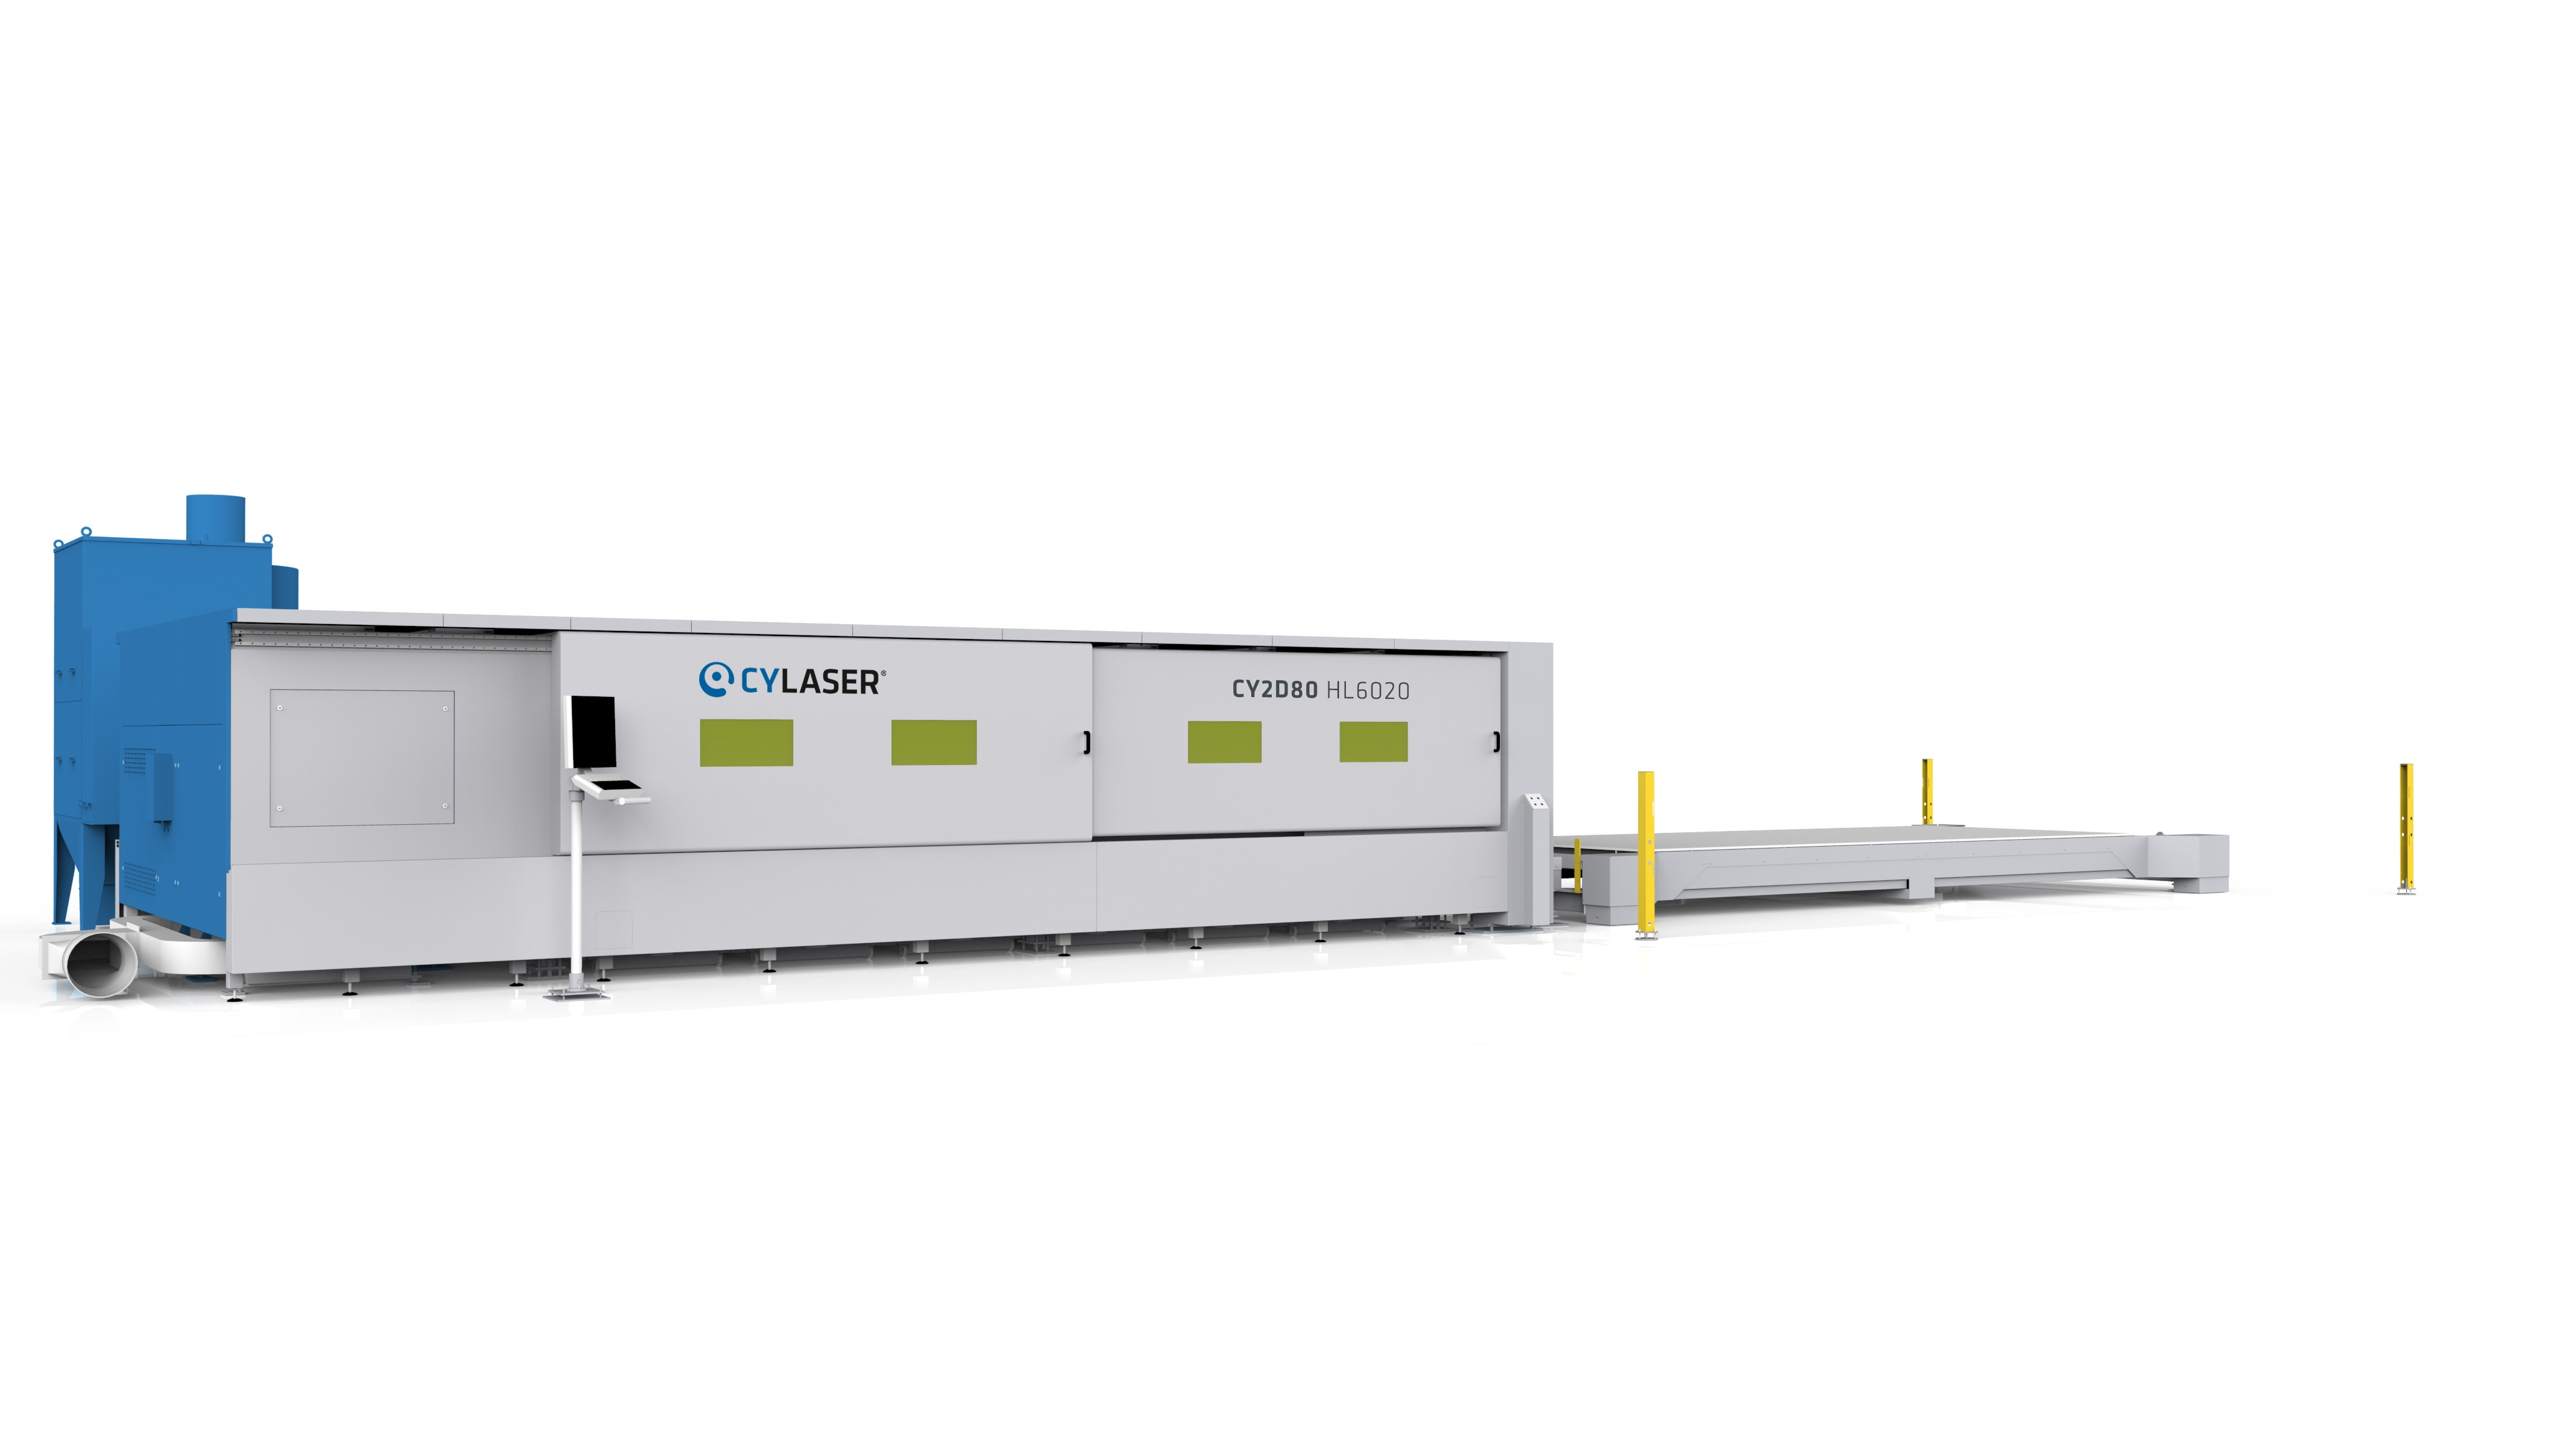 _sistema_taglio_laser_fibra_cy_laser_CY2D-hl_6020_